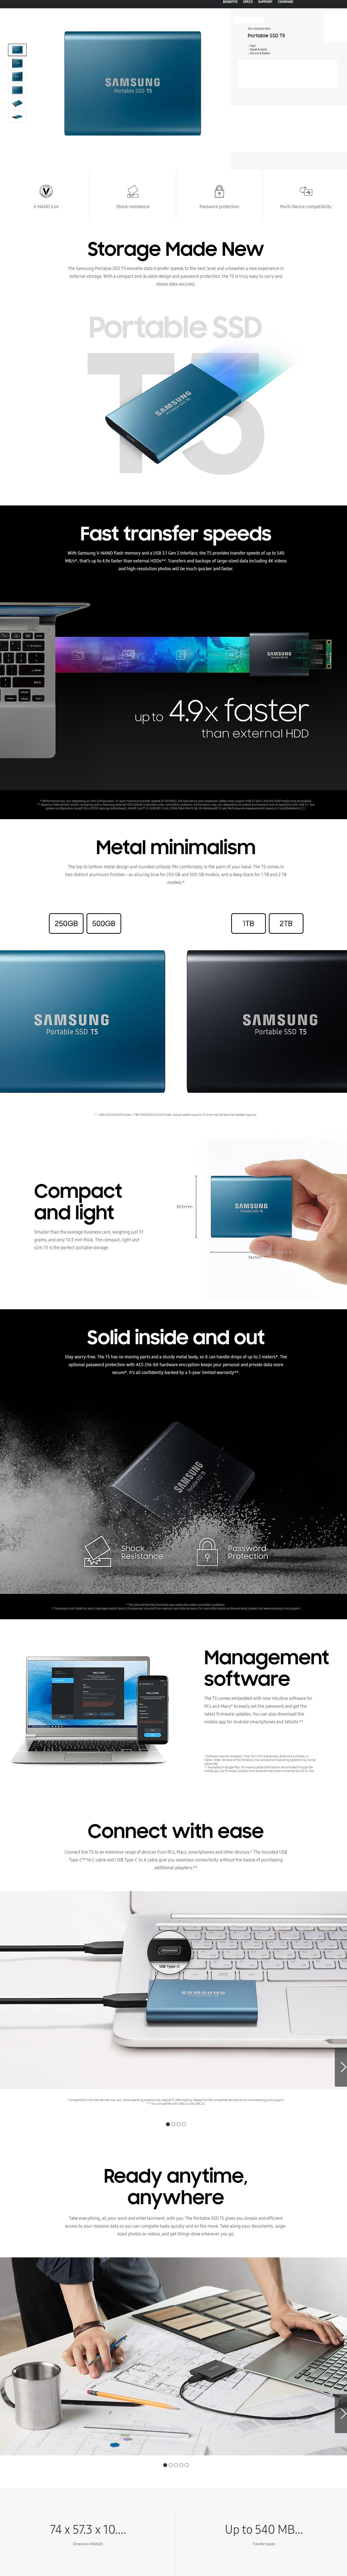 Samsung T5 500GB USB 3 1 Type-C 540MB/s Alluring Blue Portable SSD